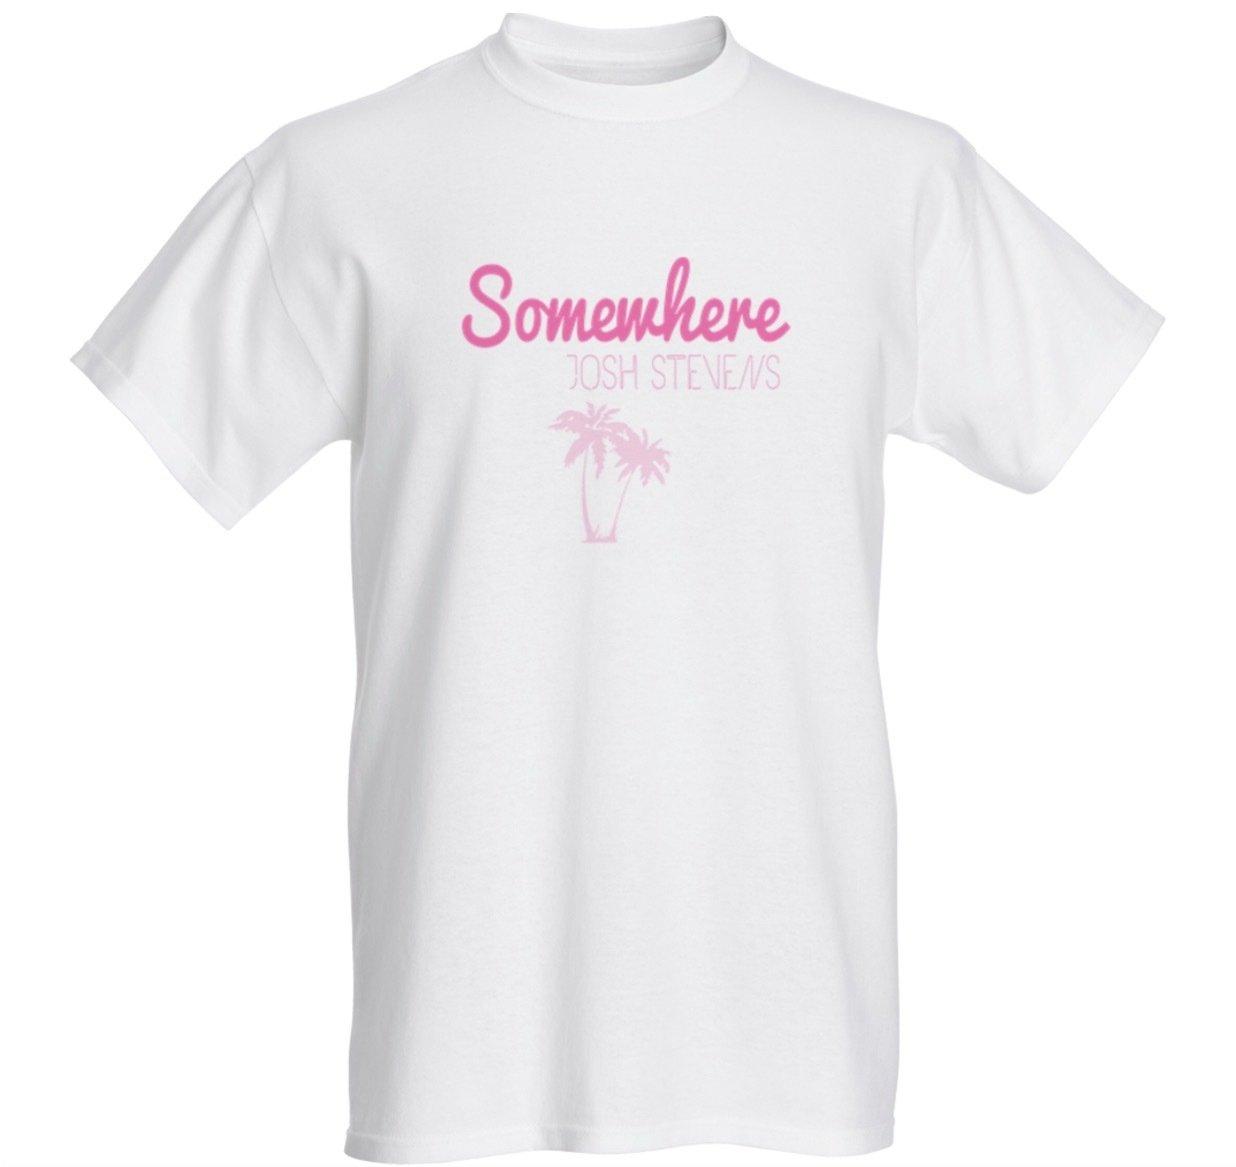 Somewhere - T-shirt